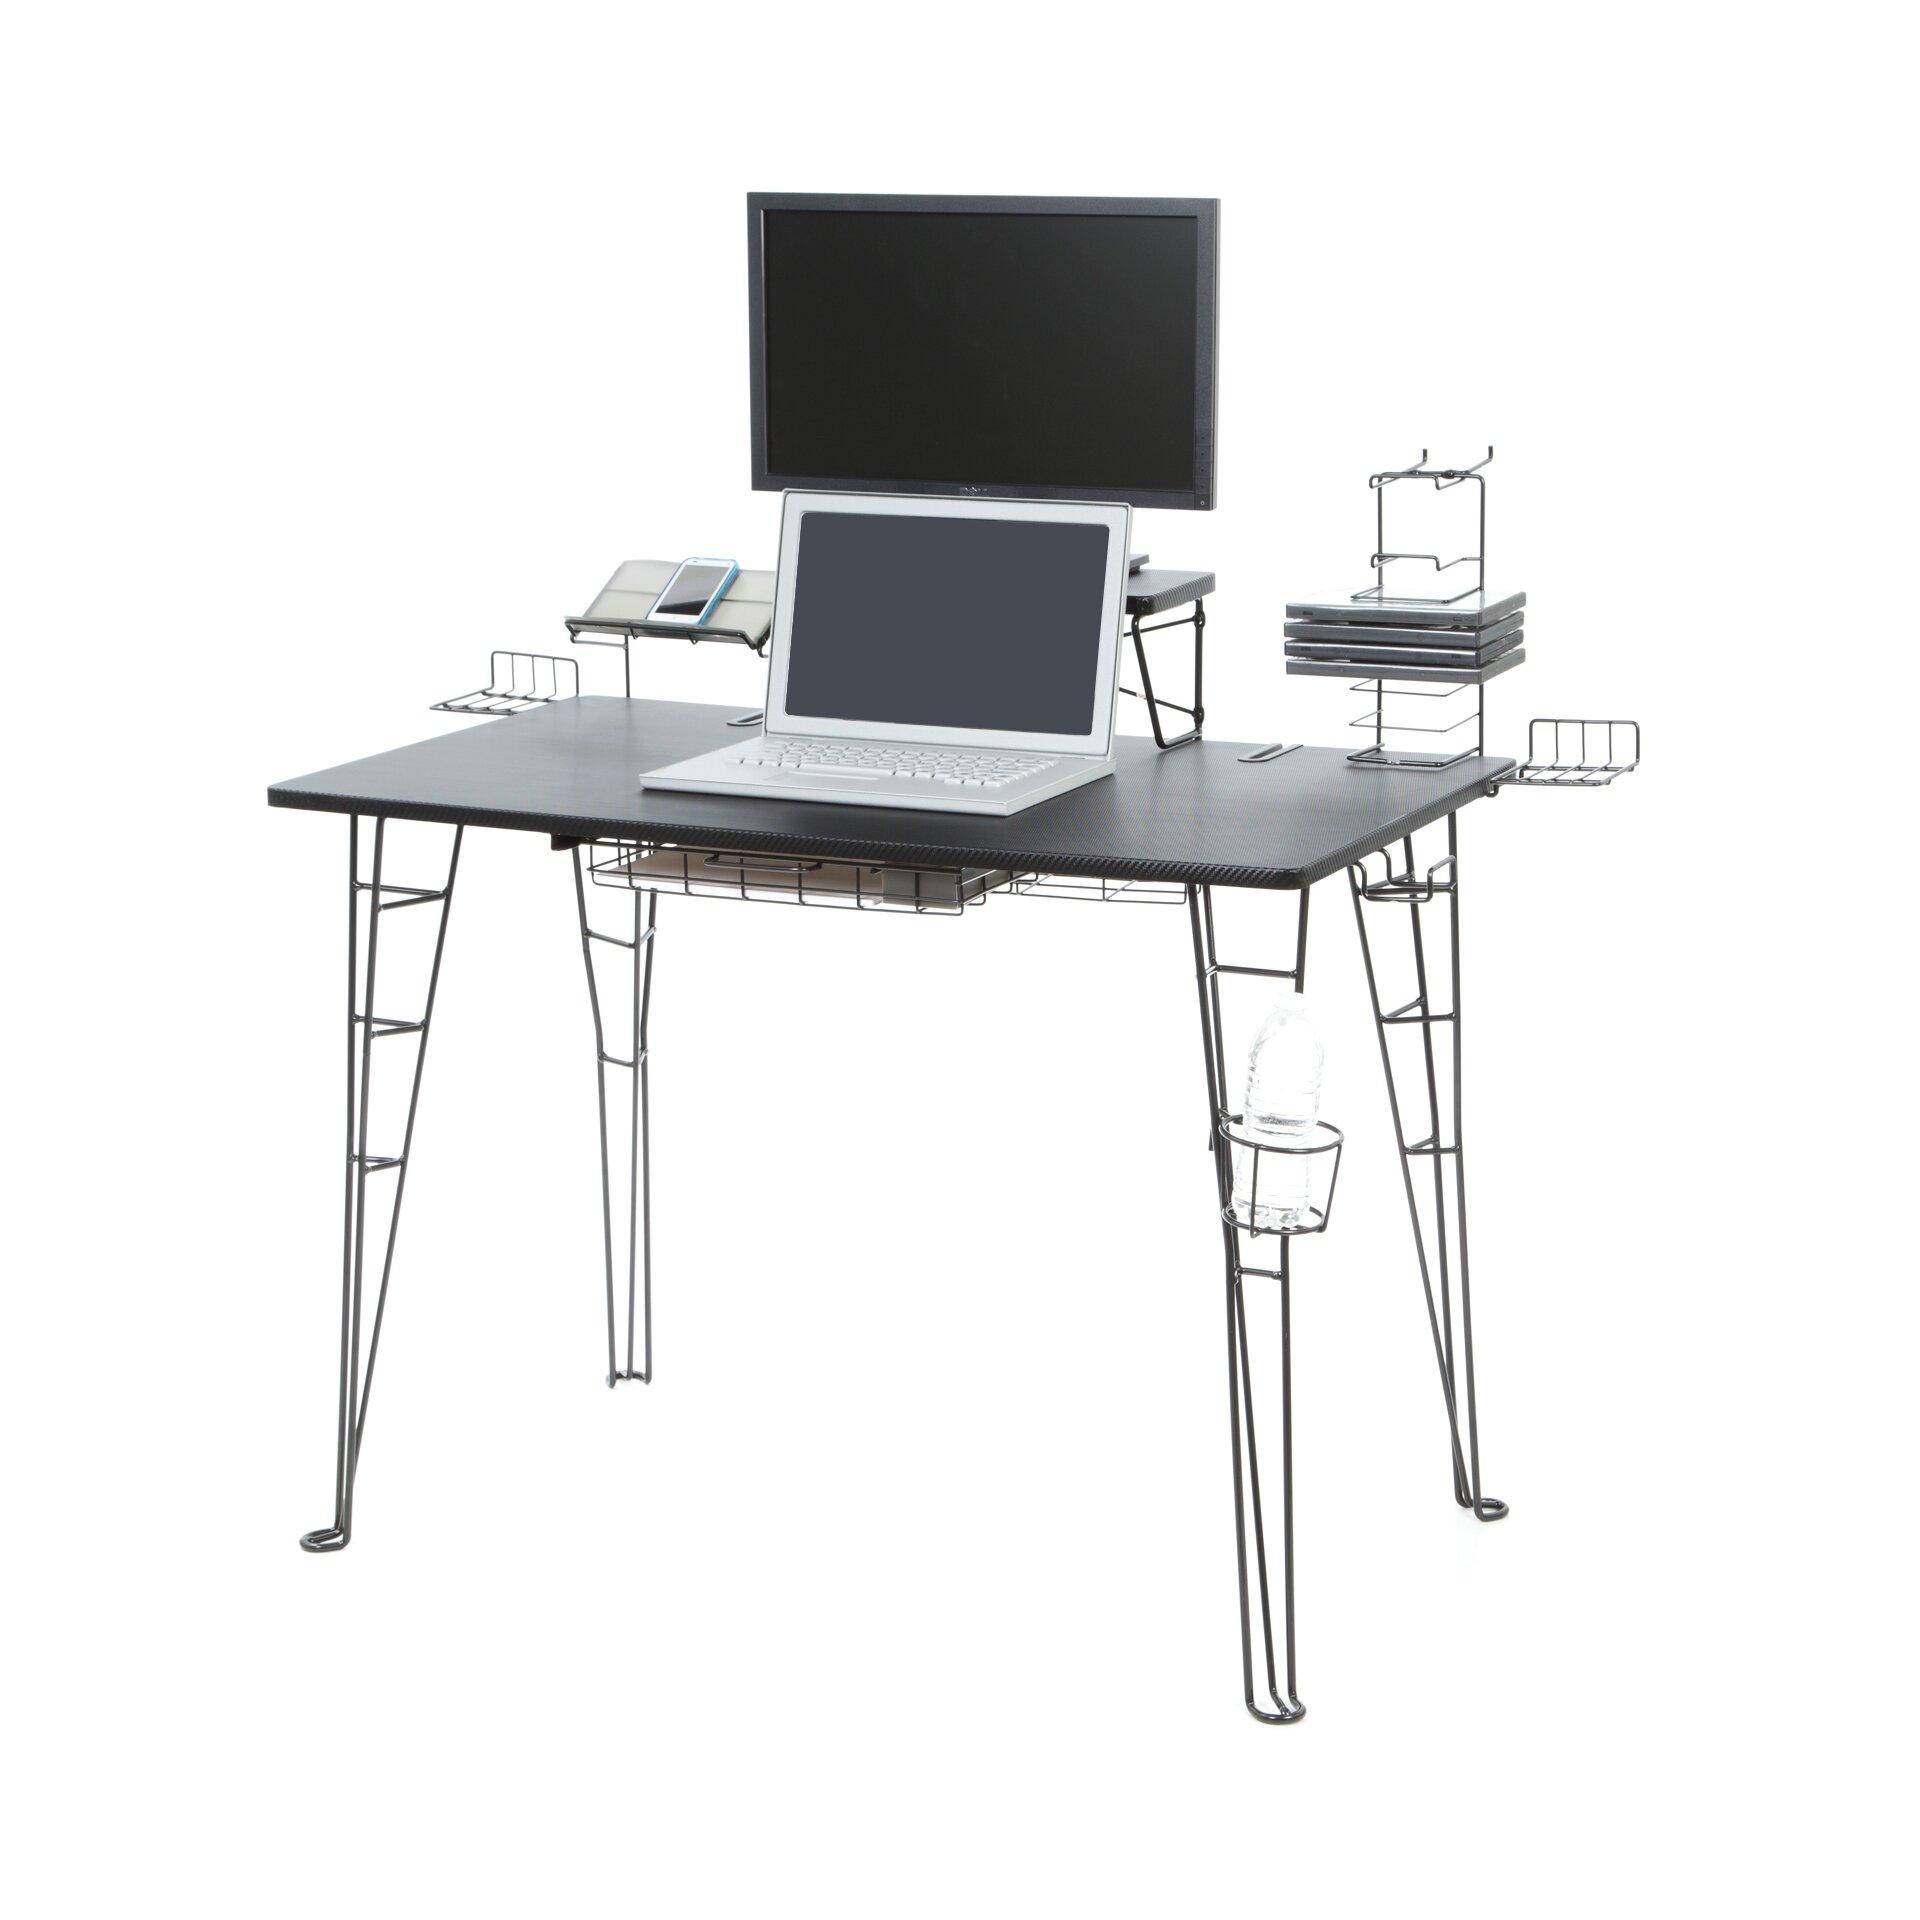 Varick Gallery Wyona Gaming puter Desk & Reviews